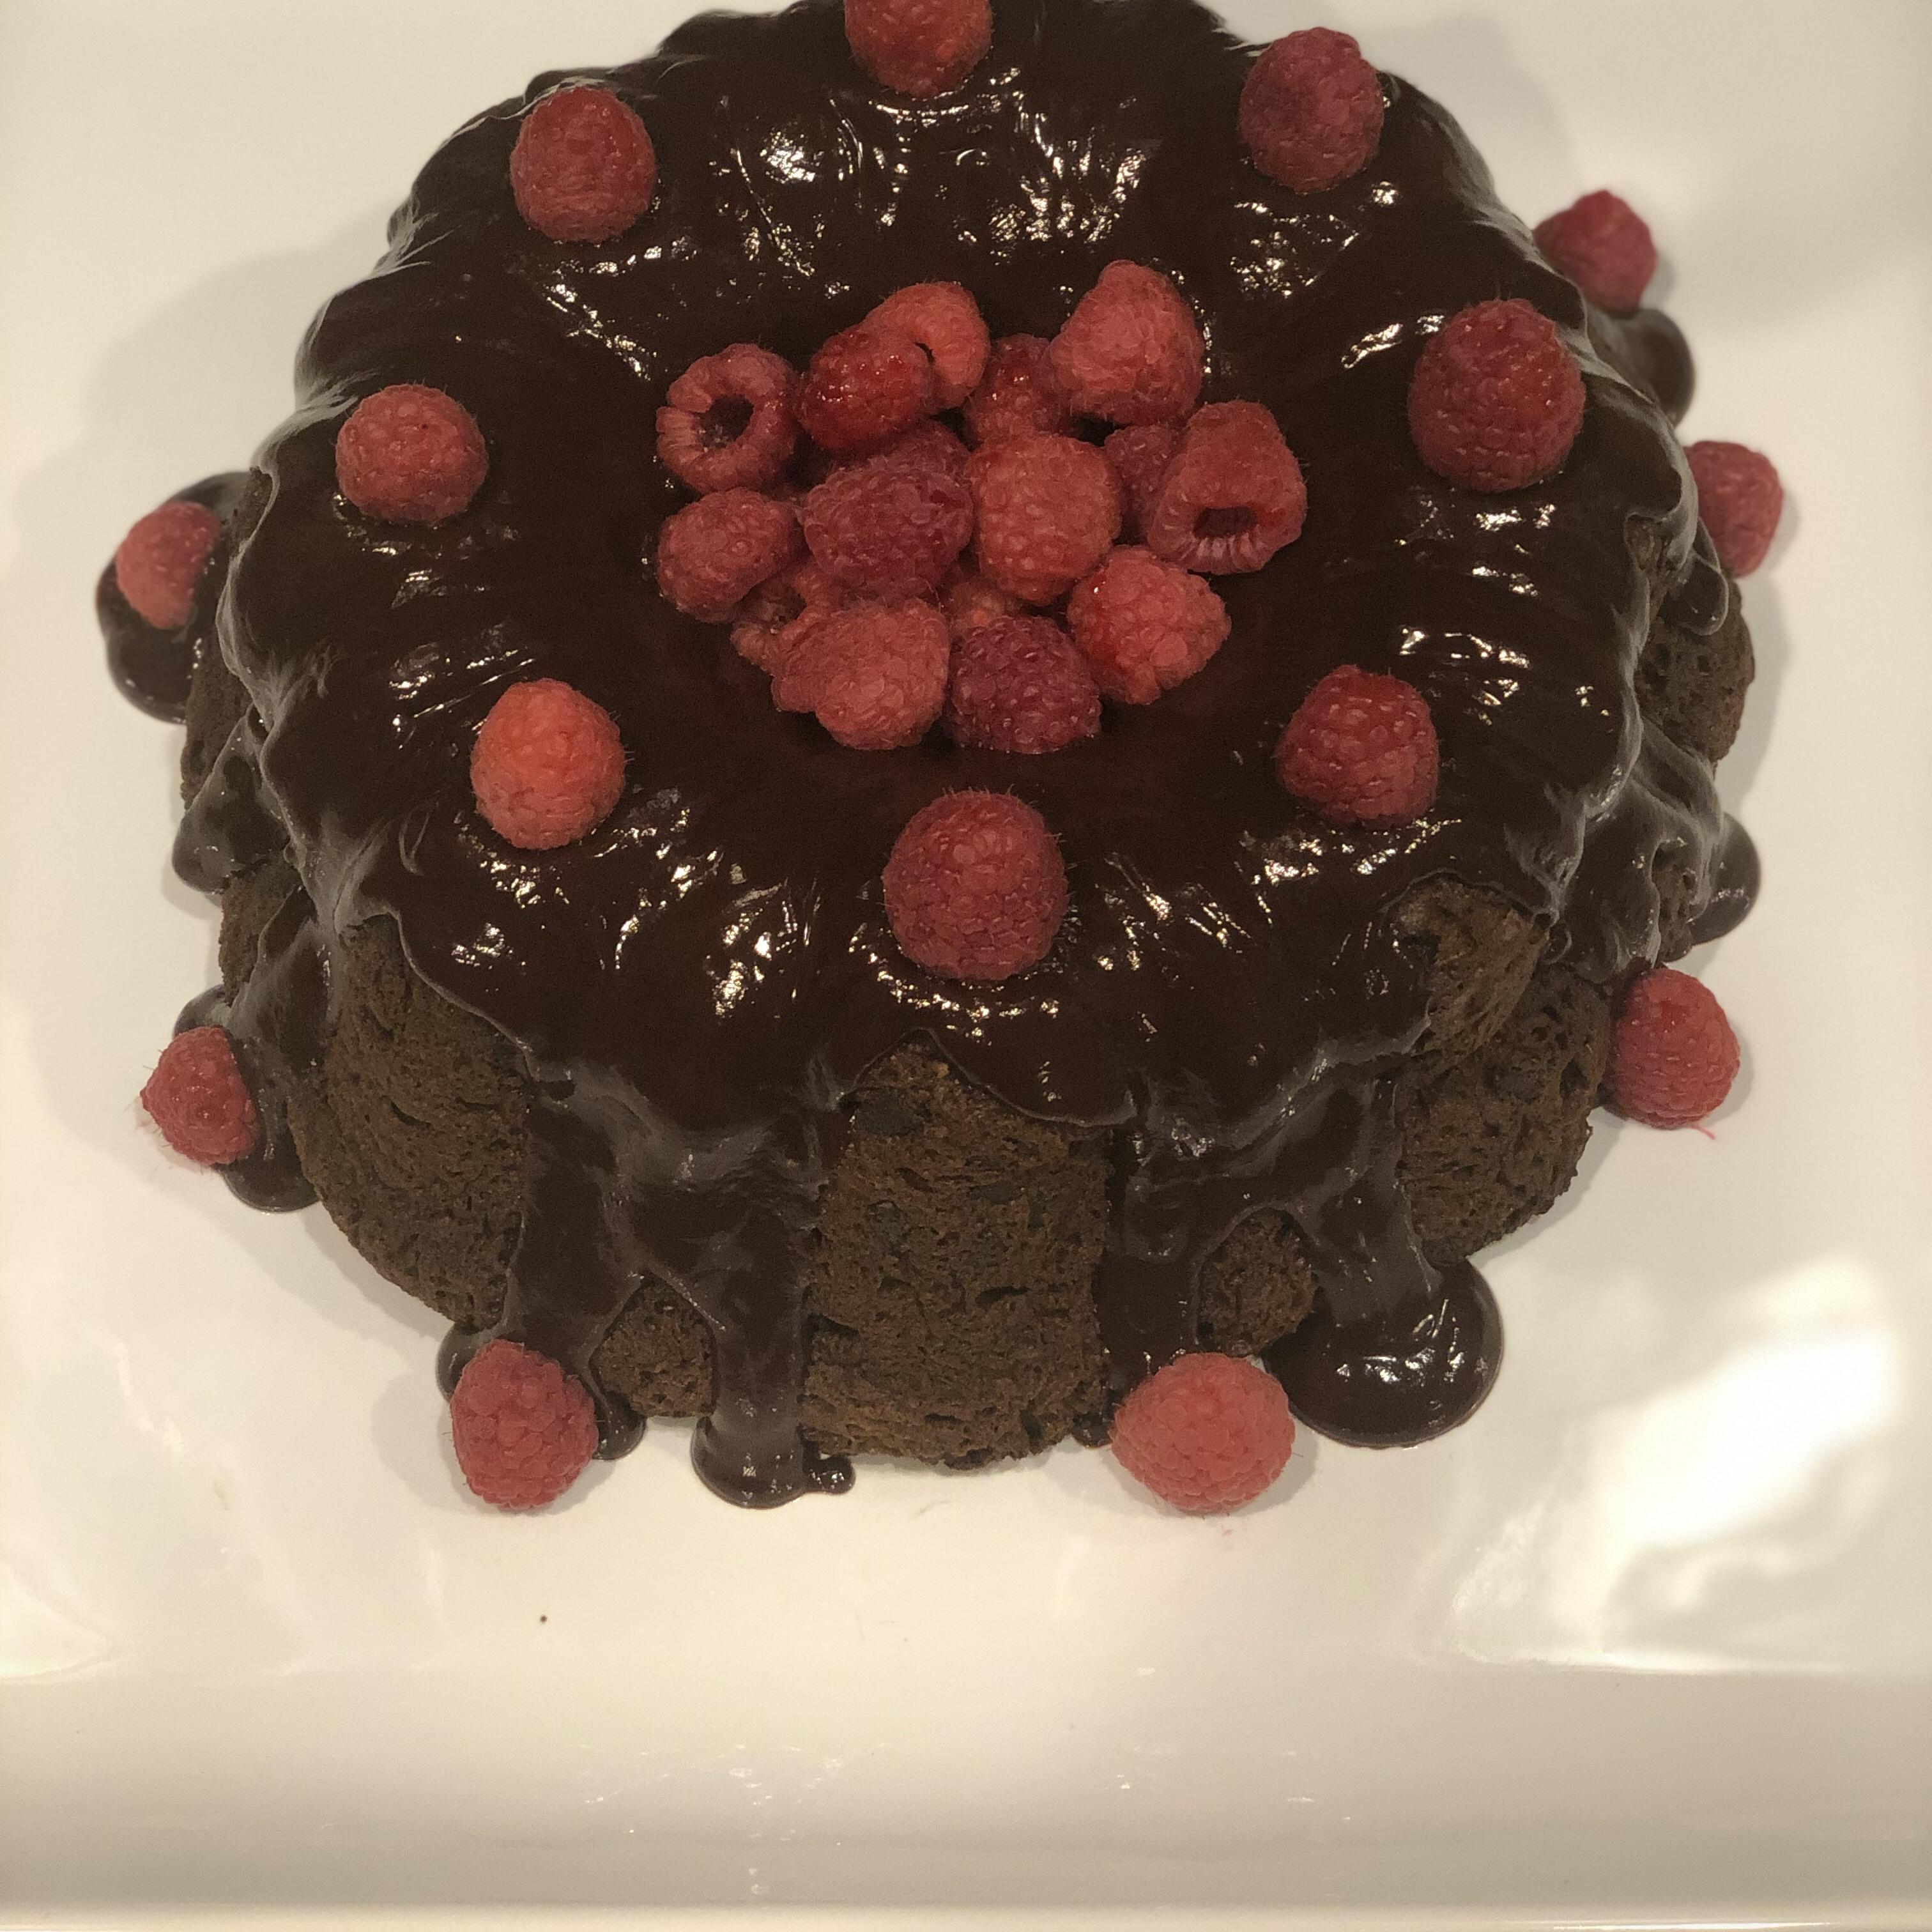 Kate's Chocolate Cake Cakeaddict12